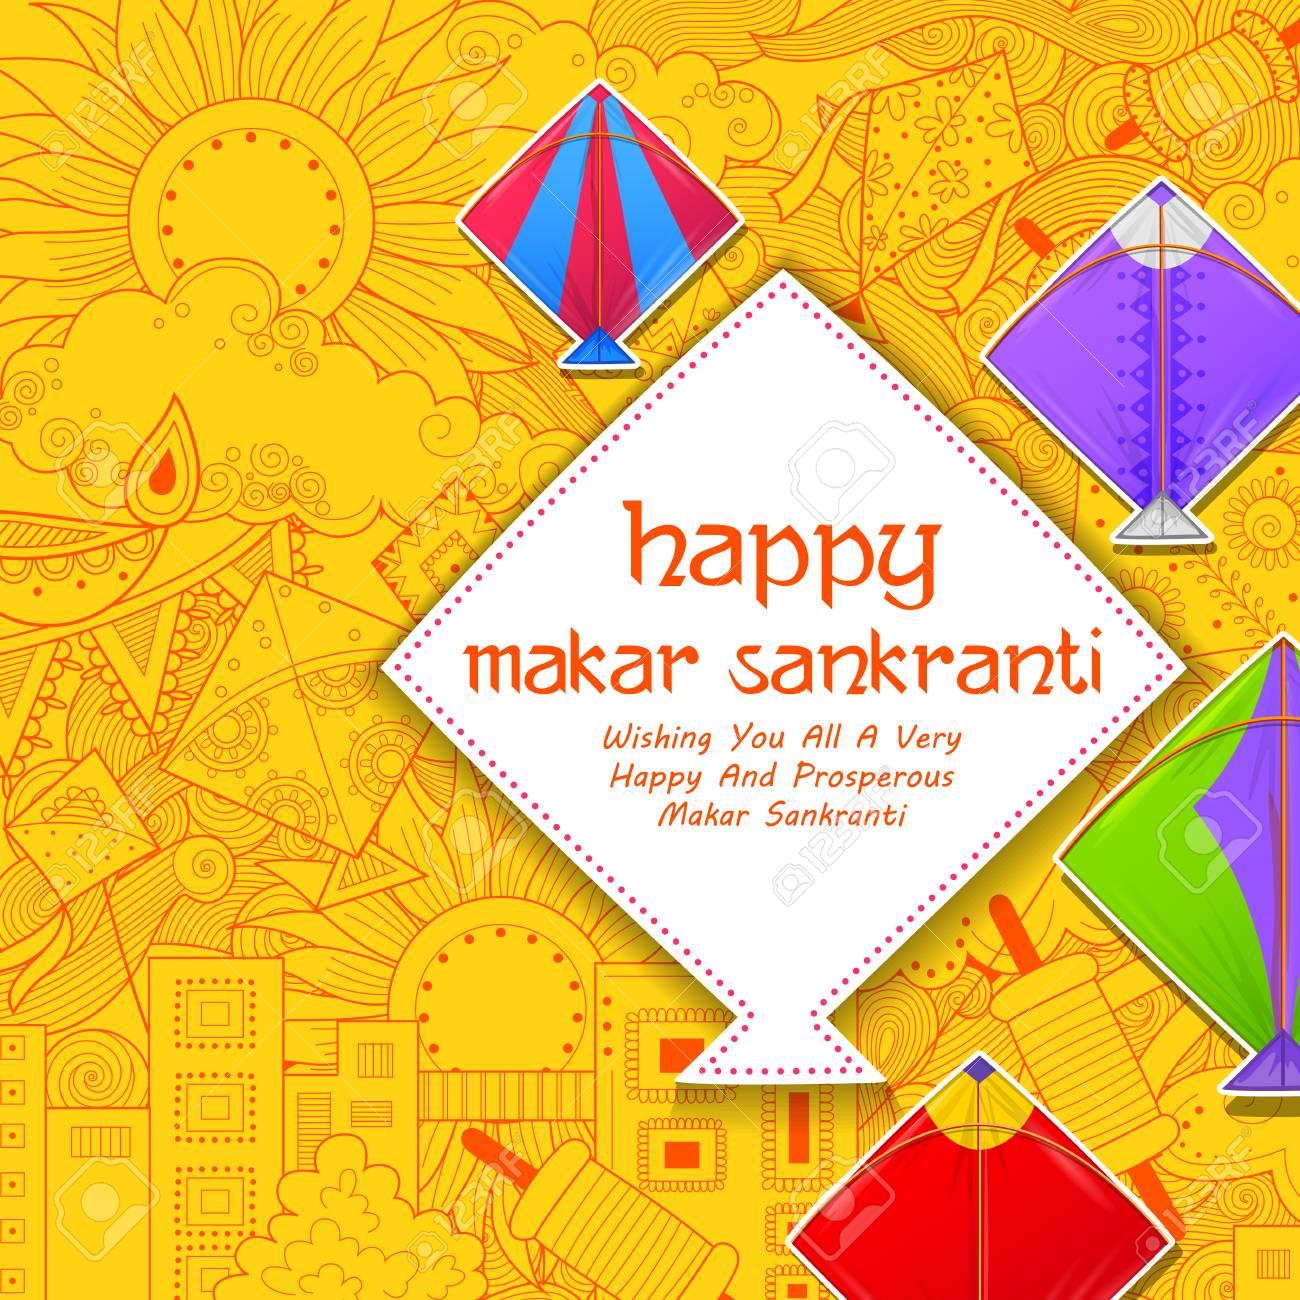 Happy Makar Sankranti wallpaper with colorful kite string for festival of India - 91805142